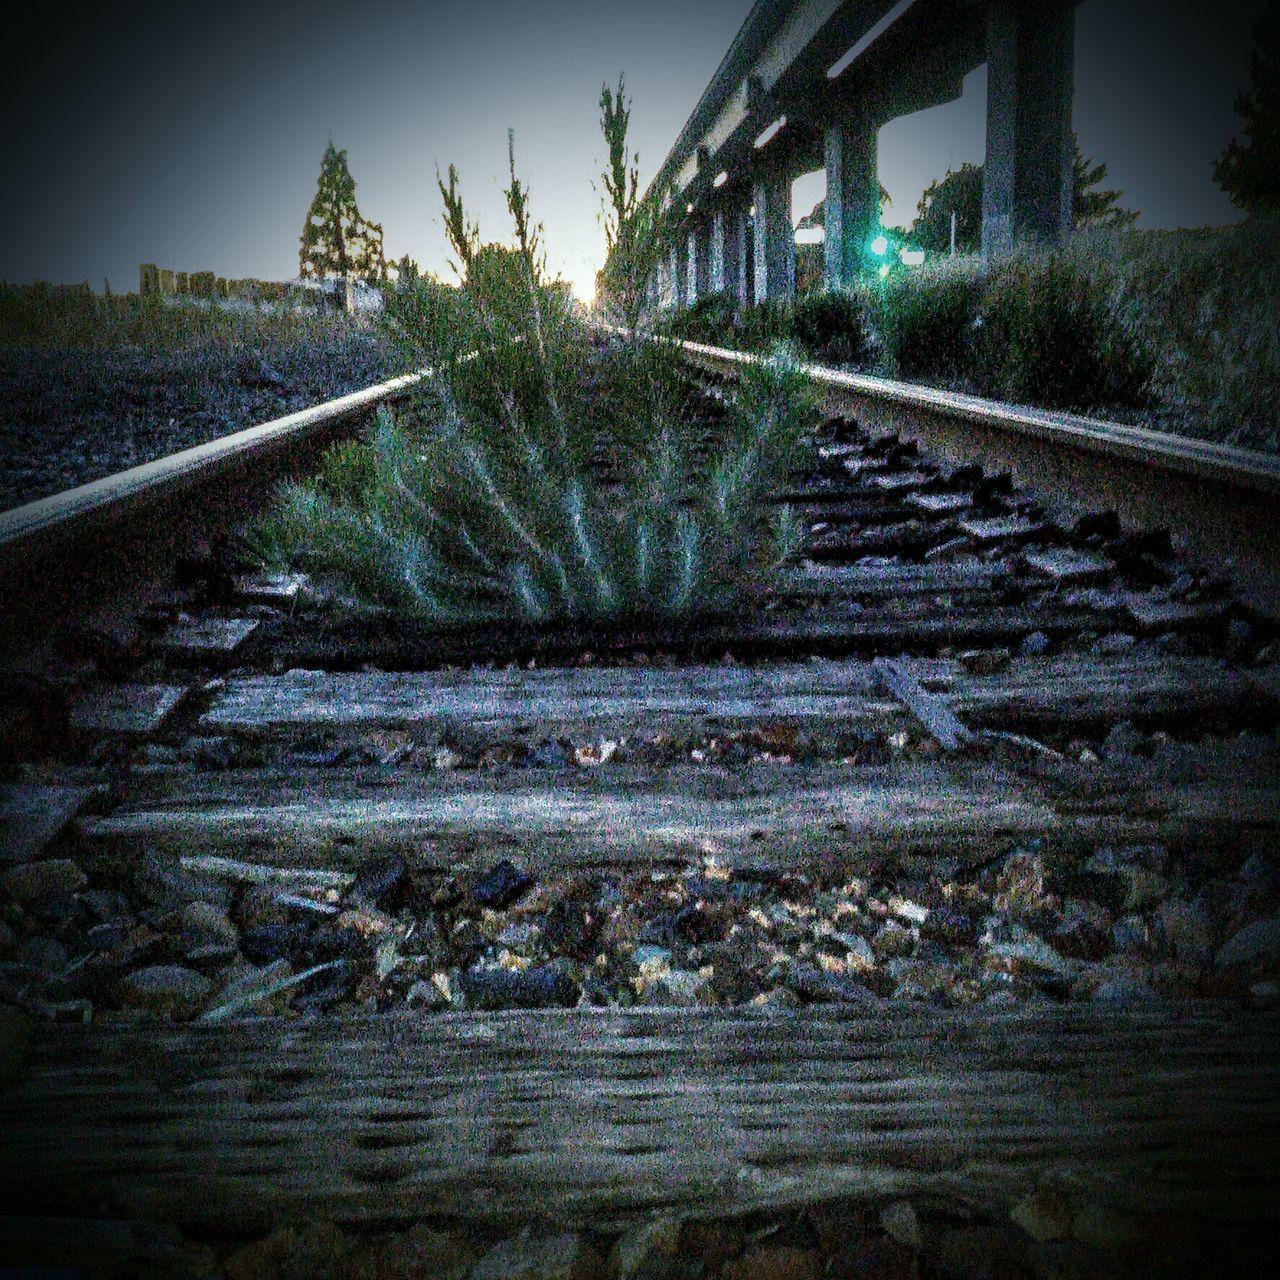 railroad track, rail transportation, transportation, railroad, no people, railway track, railway, outdoors, day, tree, nature, architecture